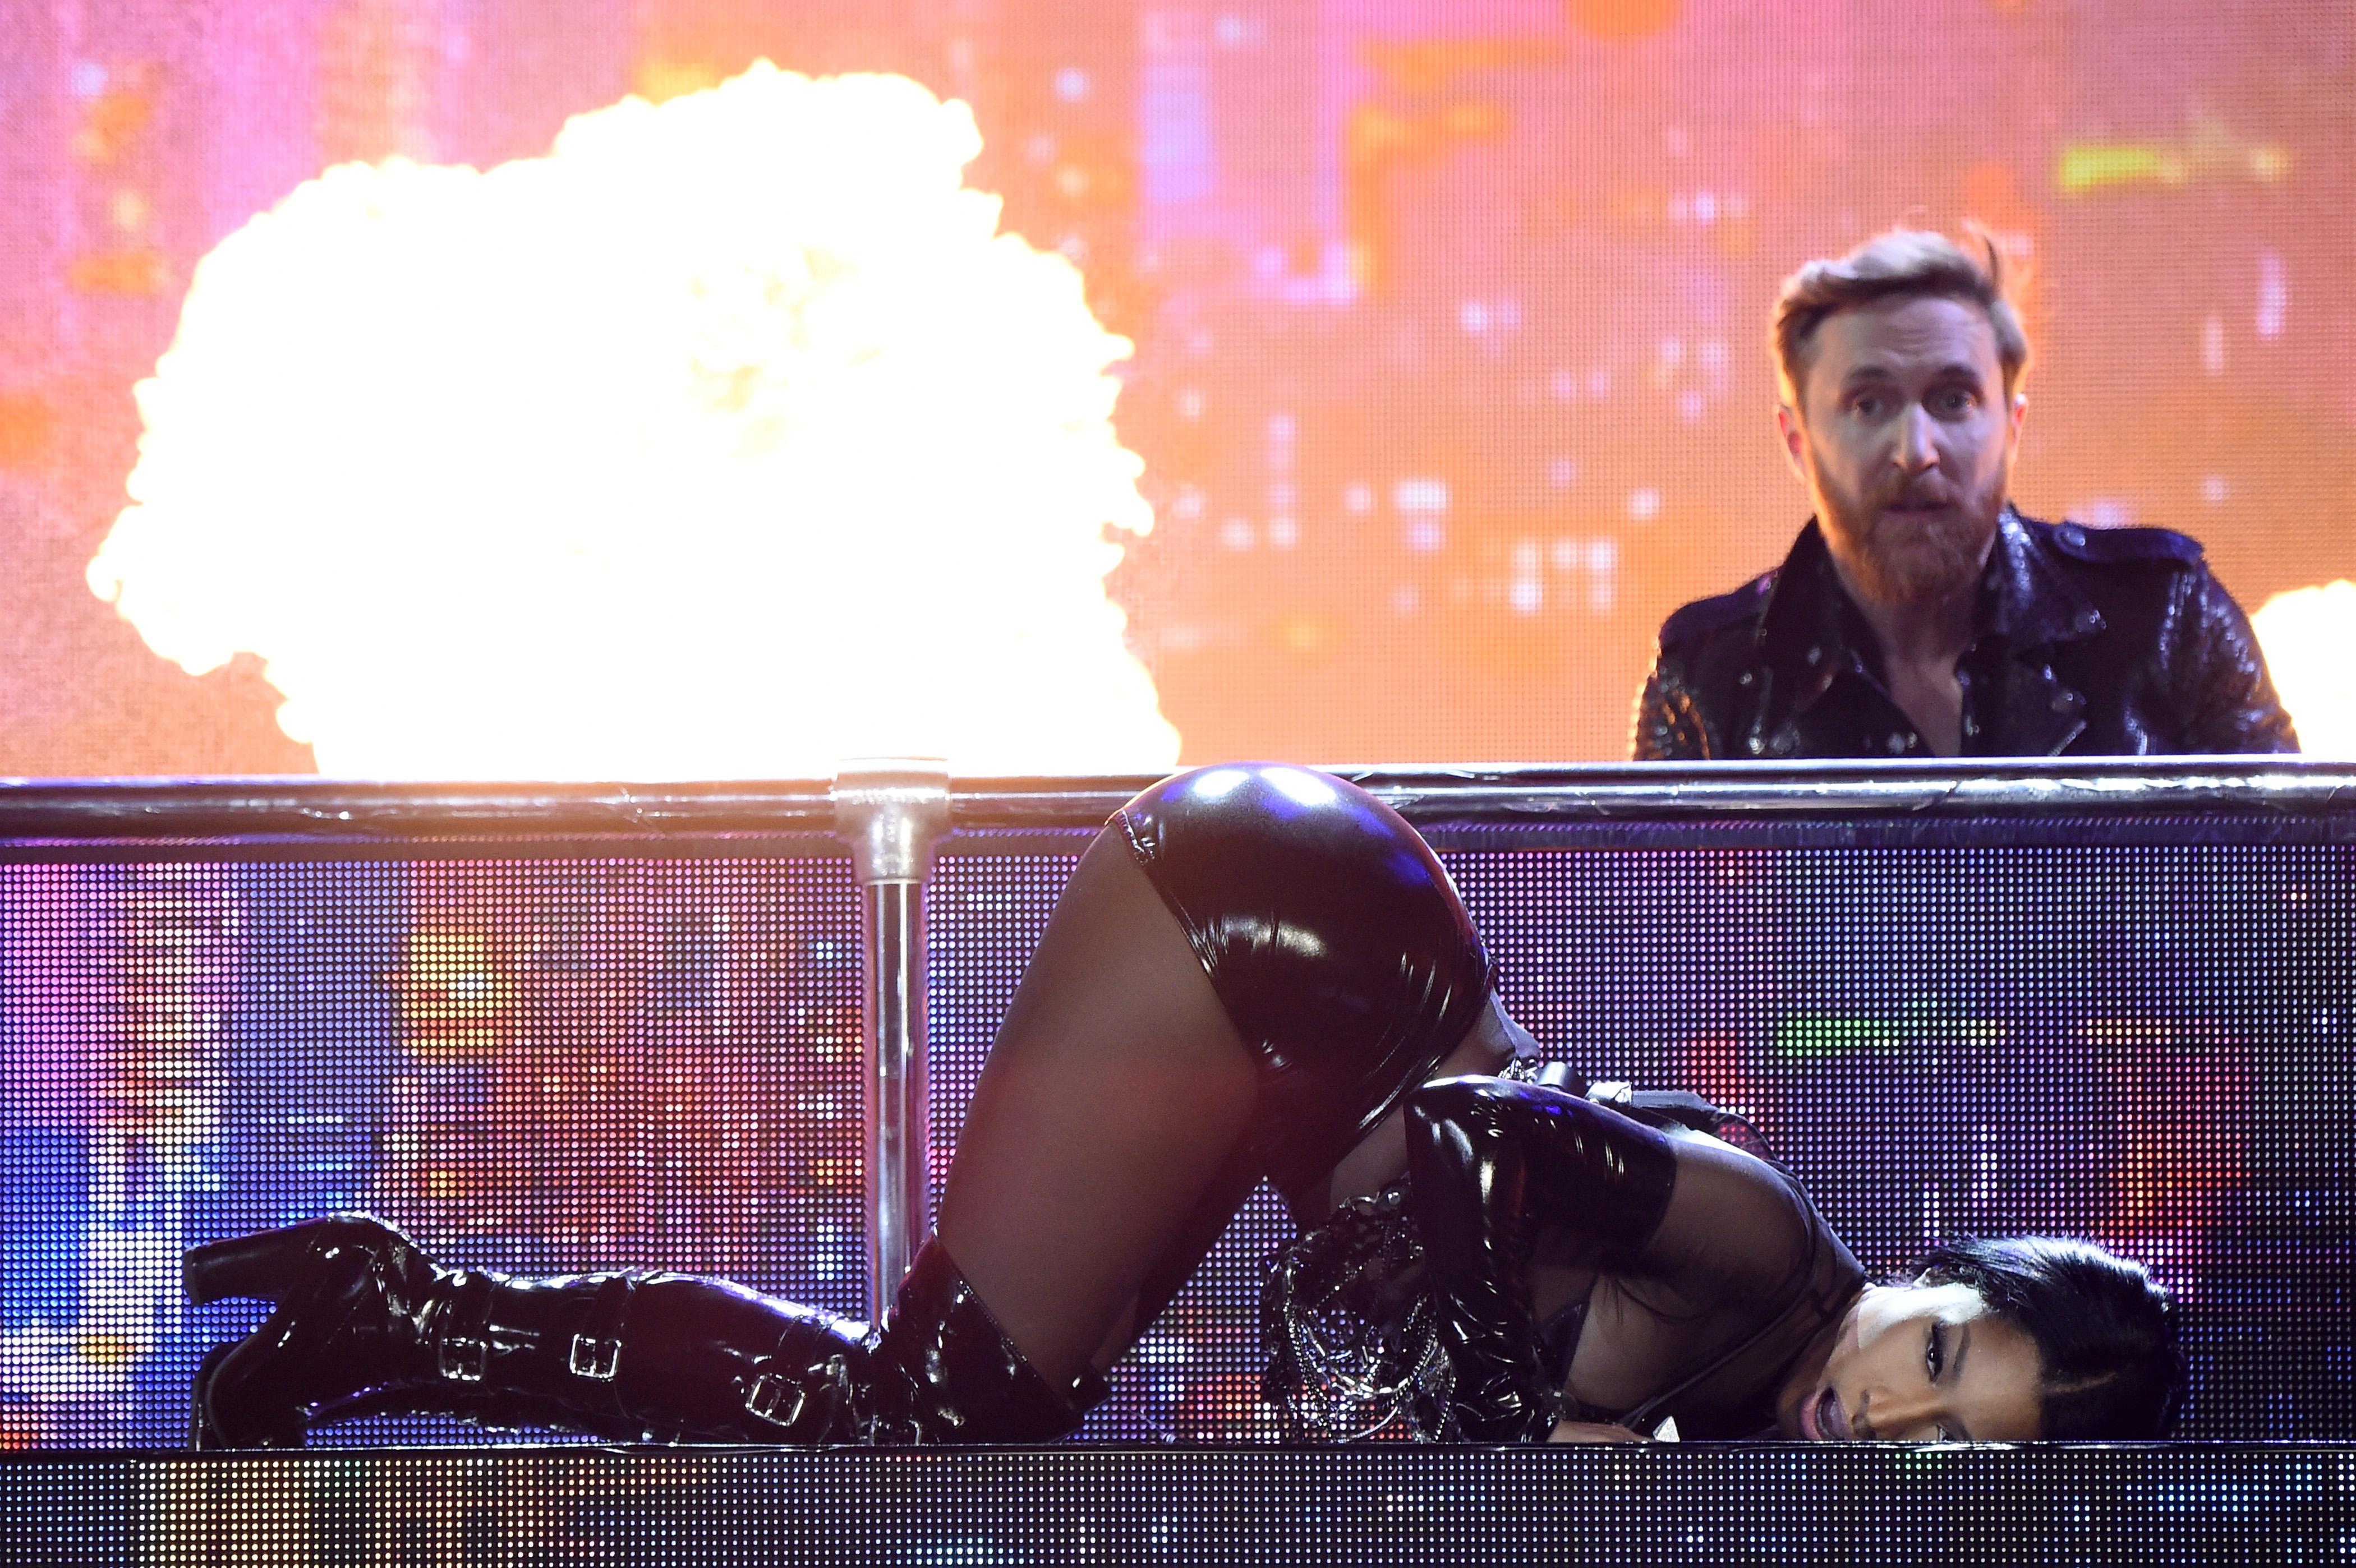 Nicki Minaj at the Billboard Music Awards 2017